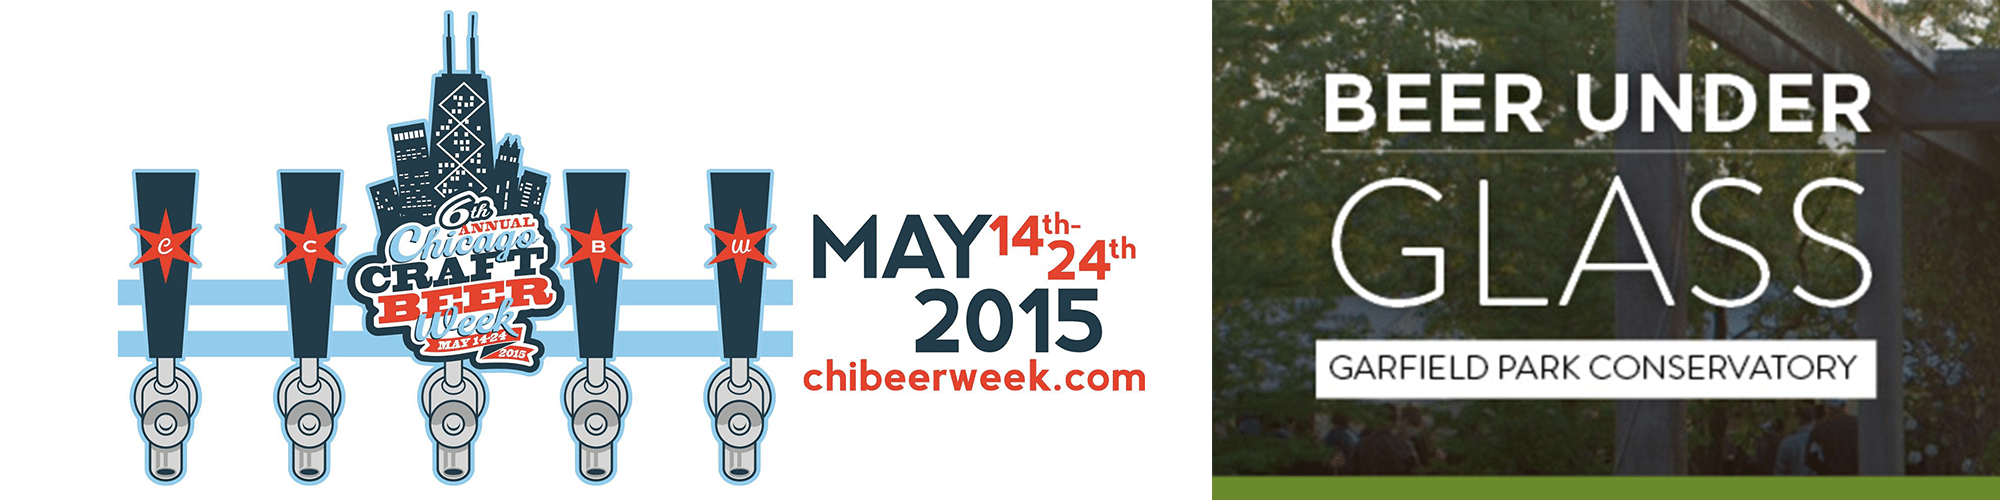 Chi-Beer-Week-Beer-Under-Glass-Event